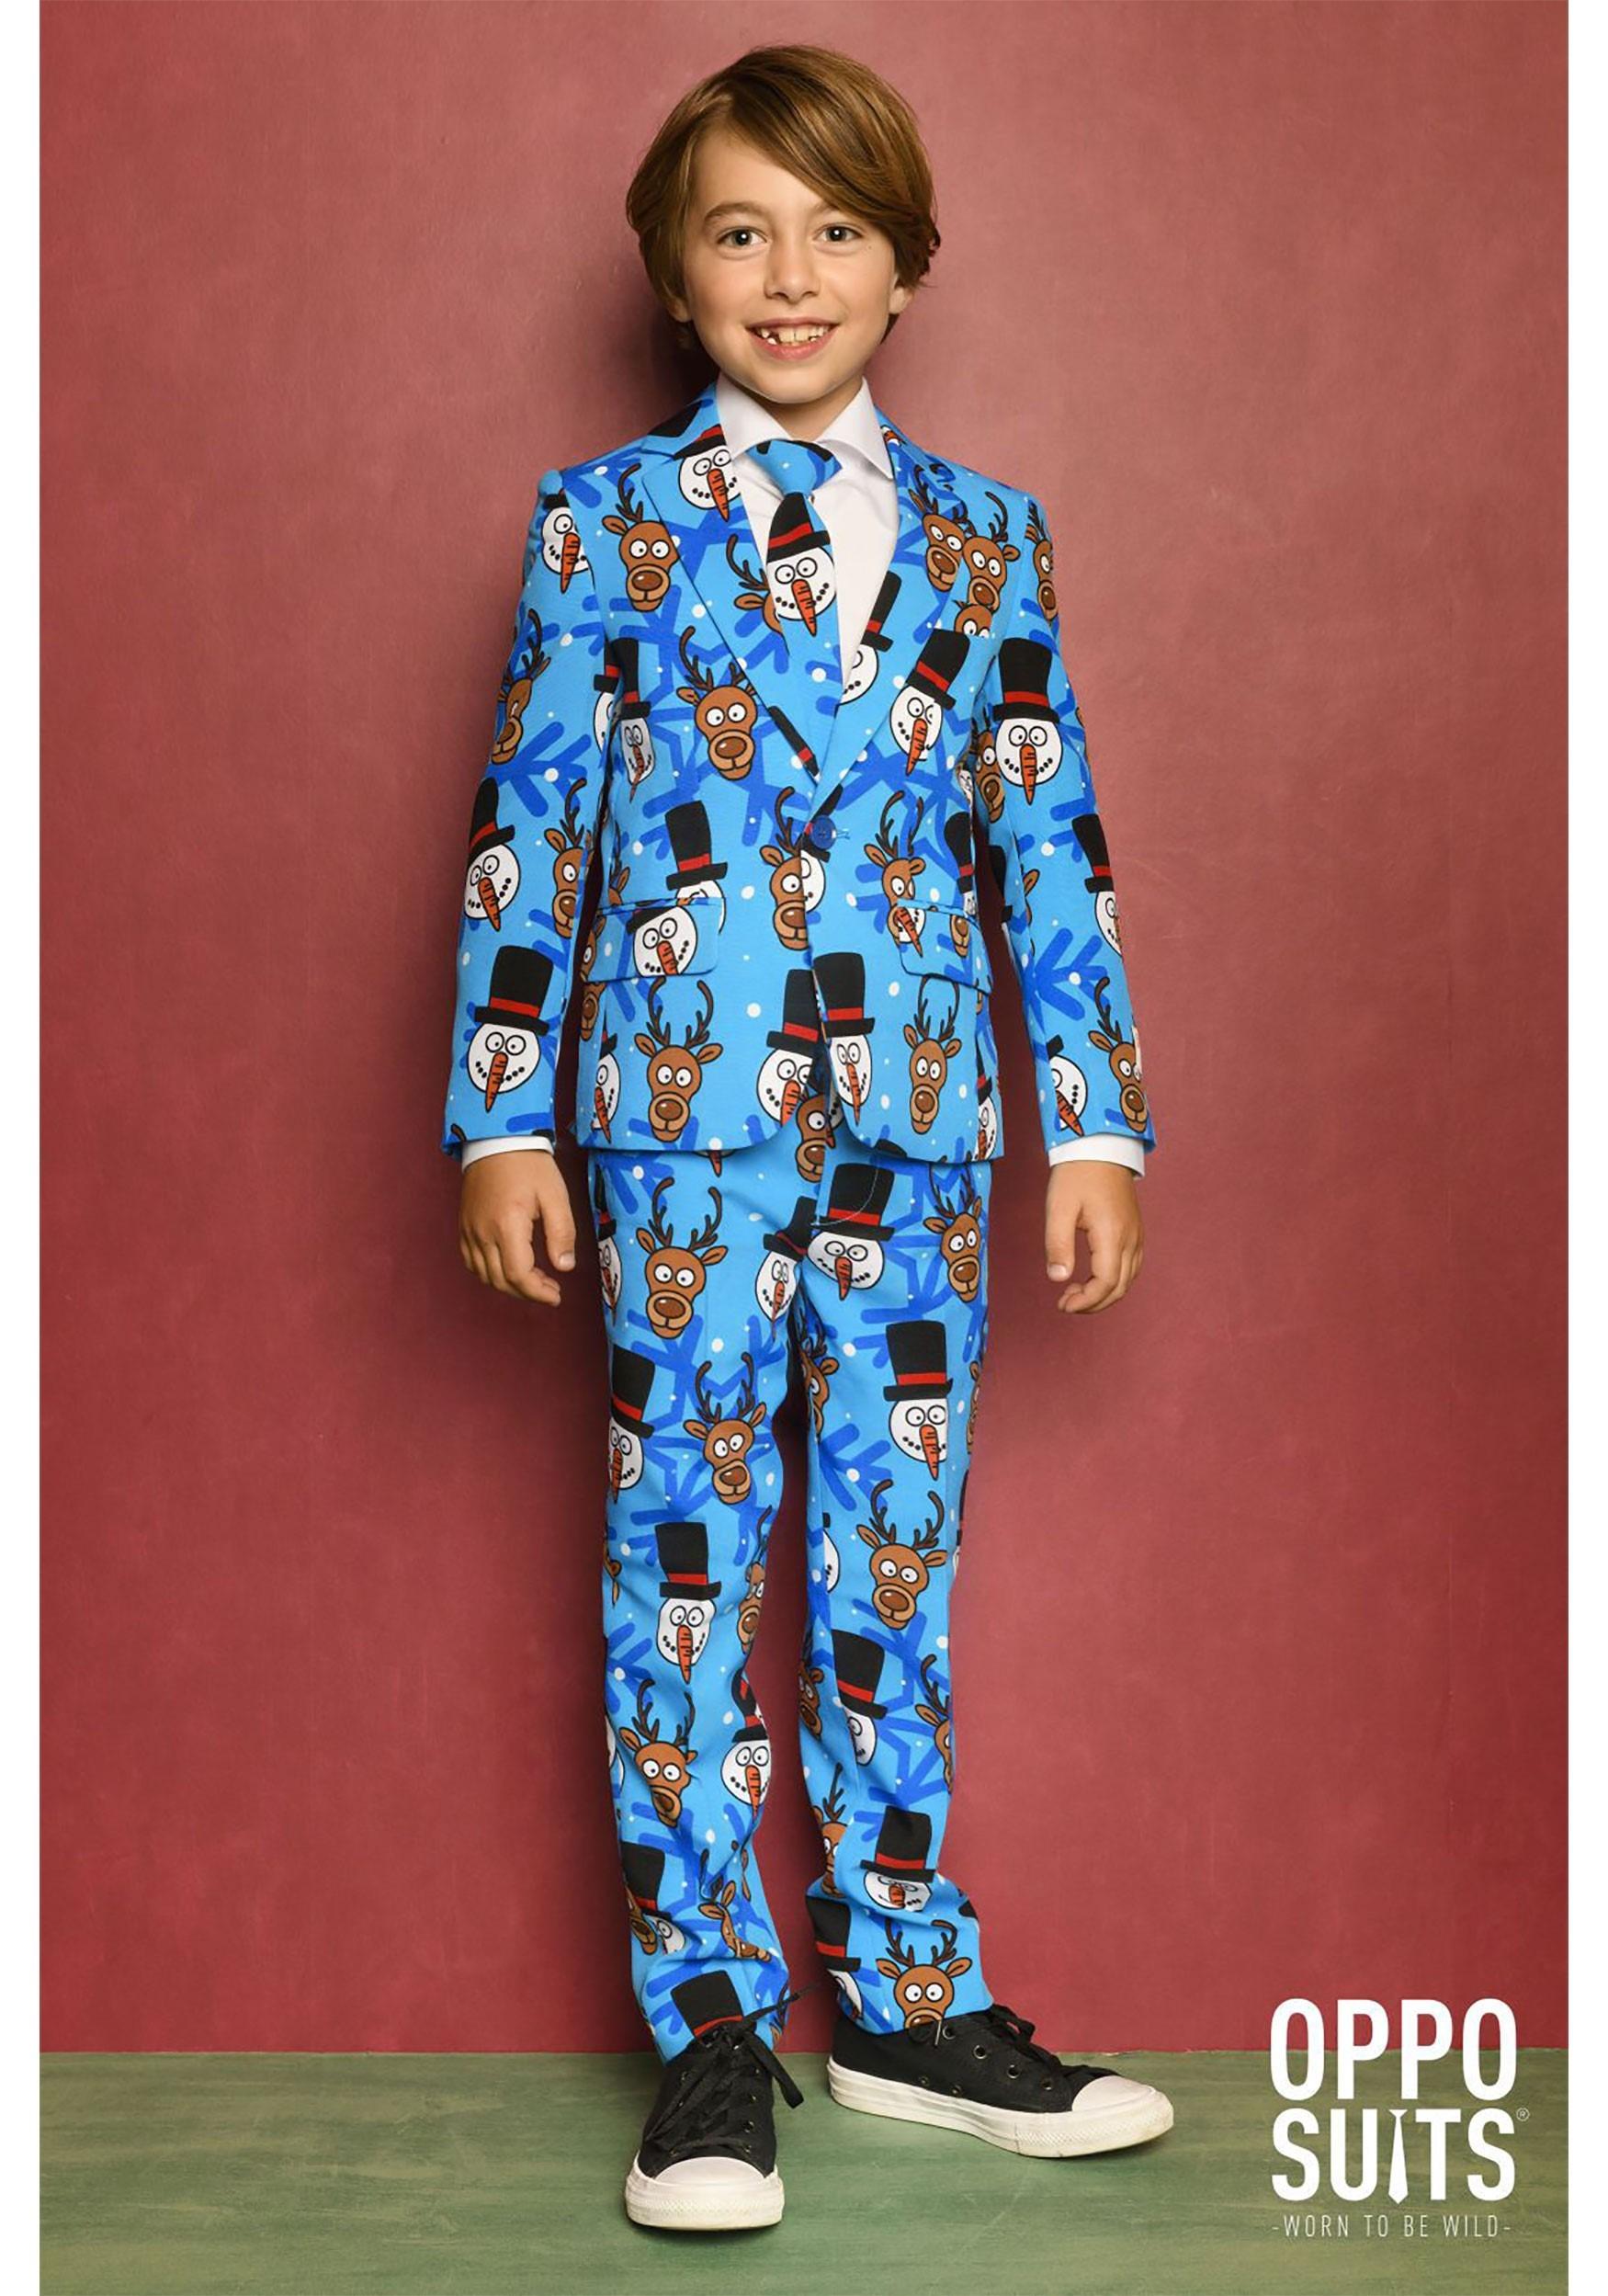 Opposuits Boys Winter Winner Suit